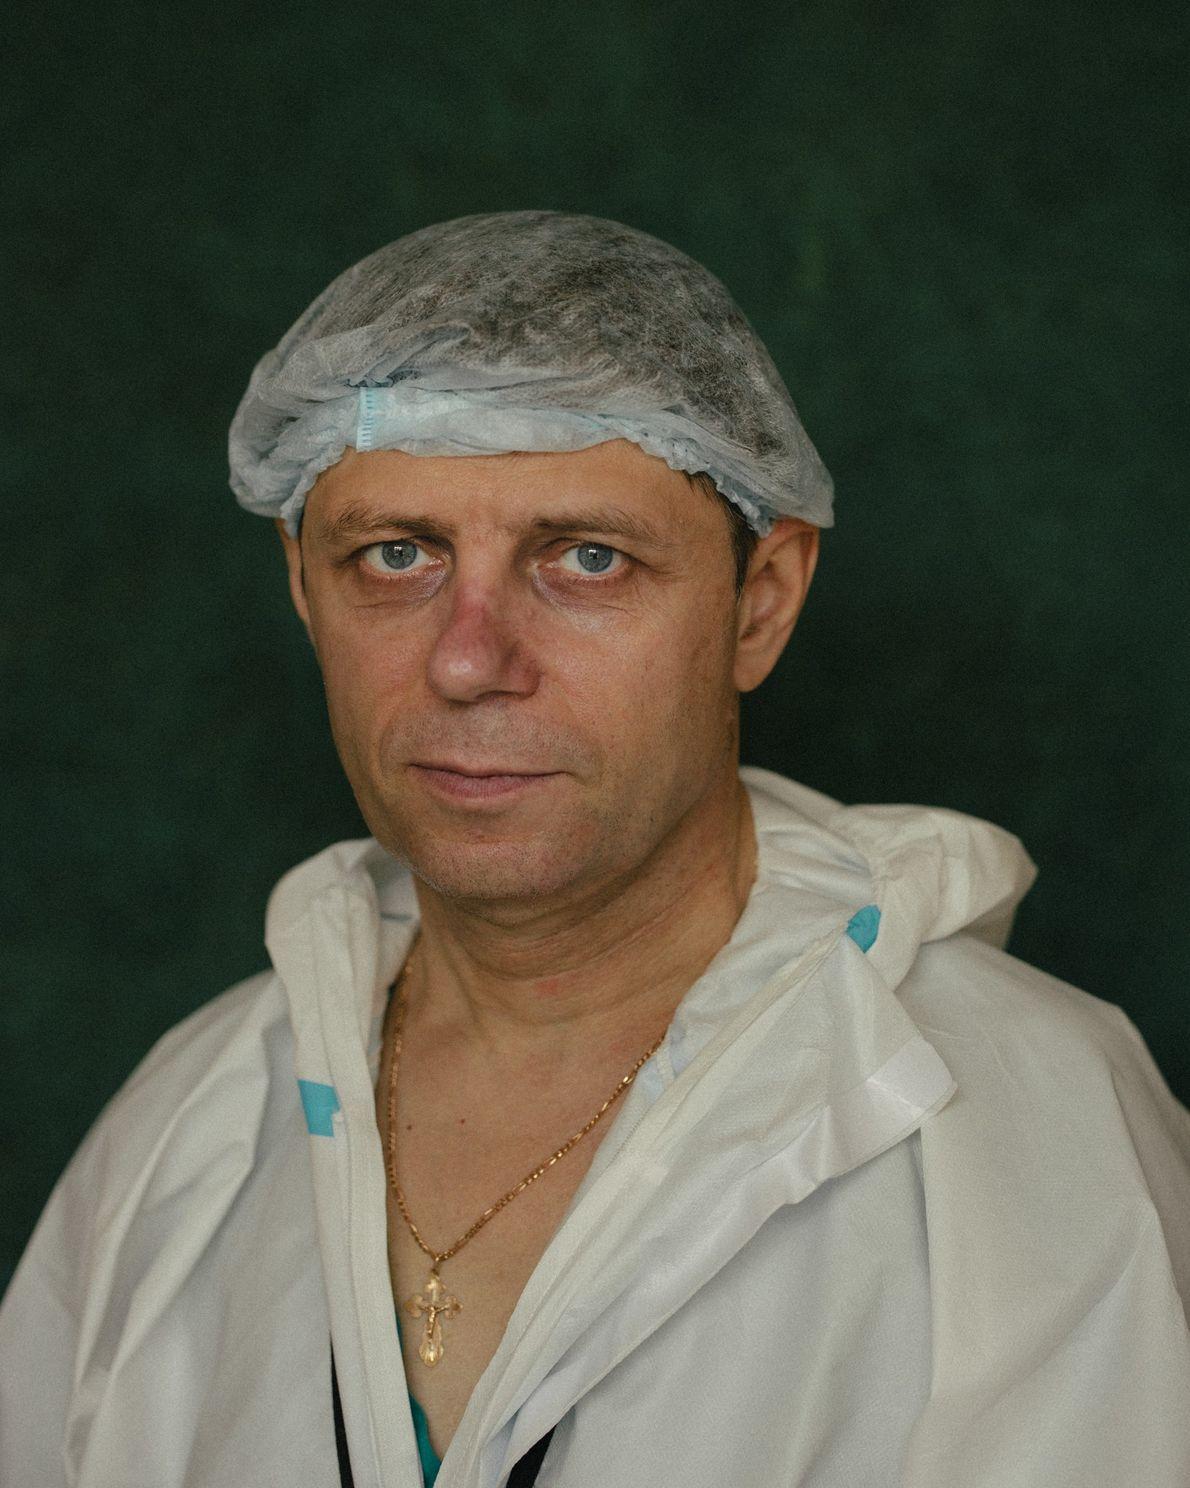 Pavel Azarov, Audiology Department head.